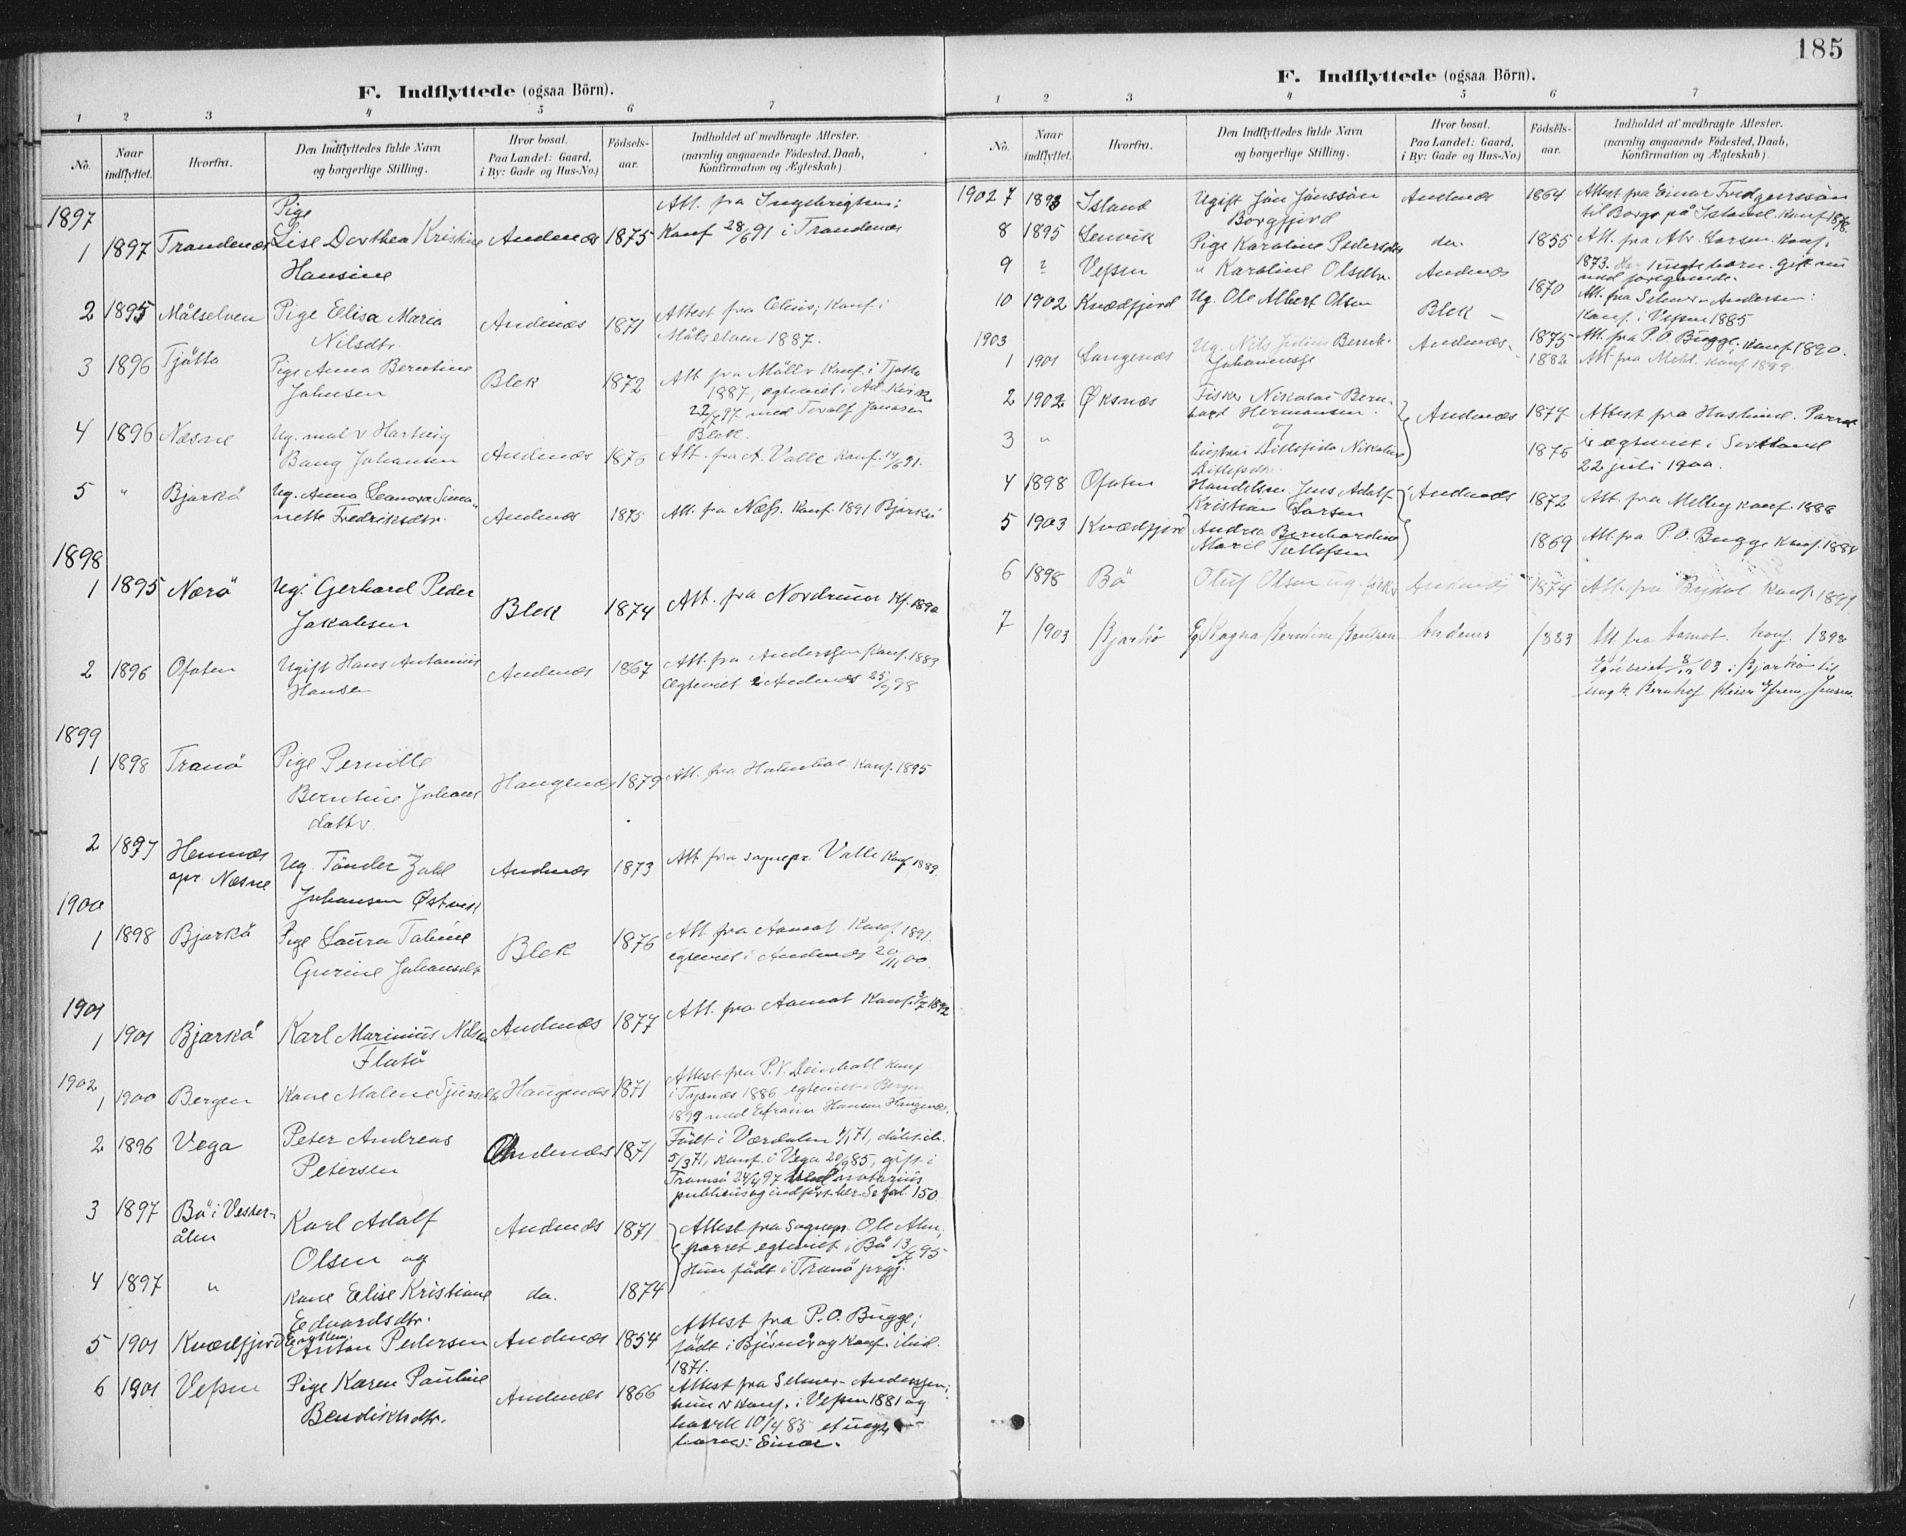 SAT, Ministerialprotokoller, klokkerbøker og fødselsregistre - Nordland, 899/L1437: Ministerialbok nr. 899A05, 1897-1908, s. 185